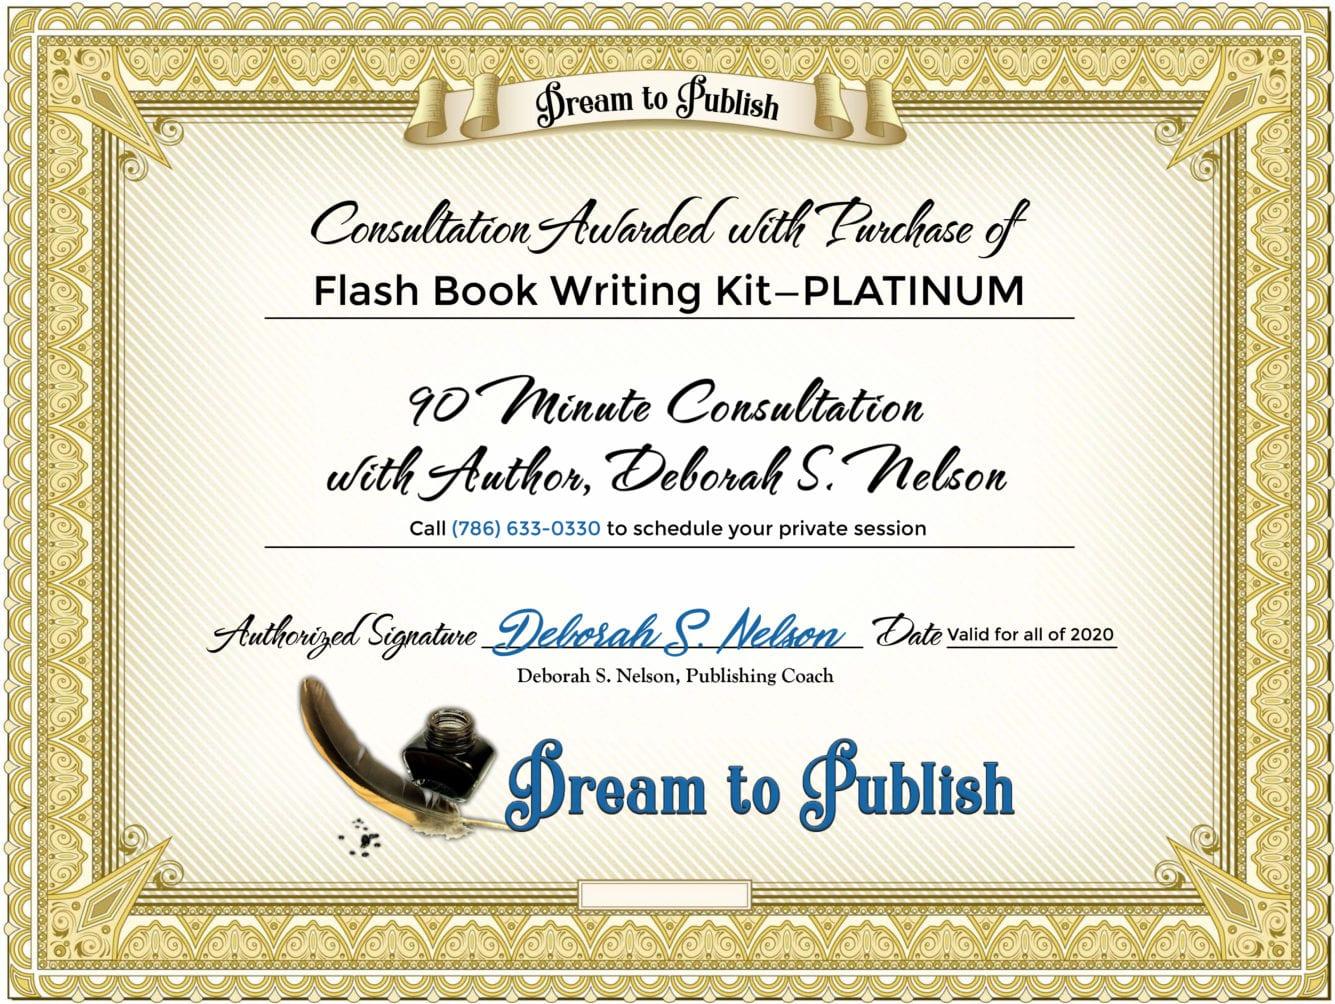 Flash Book Writing Kit—PLATINUM Certificate